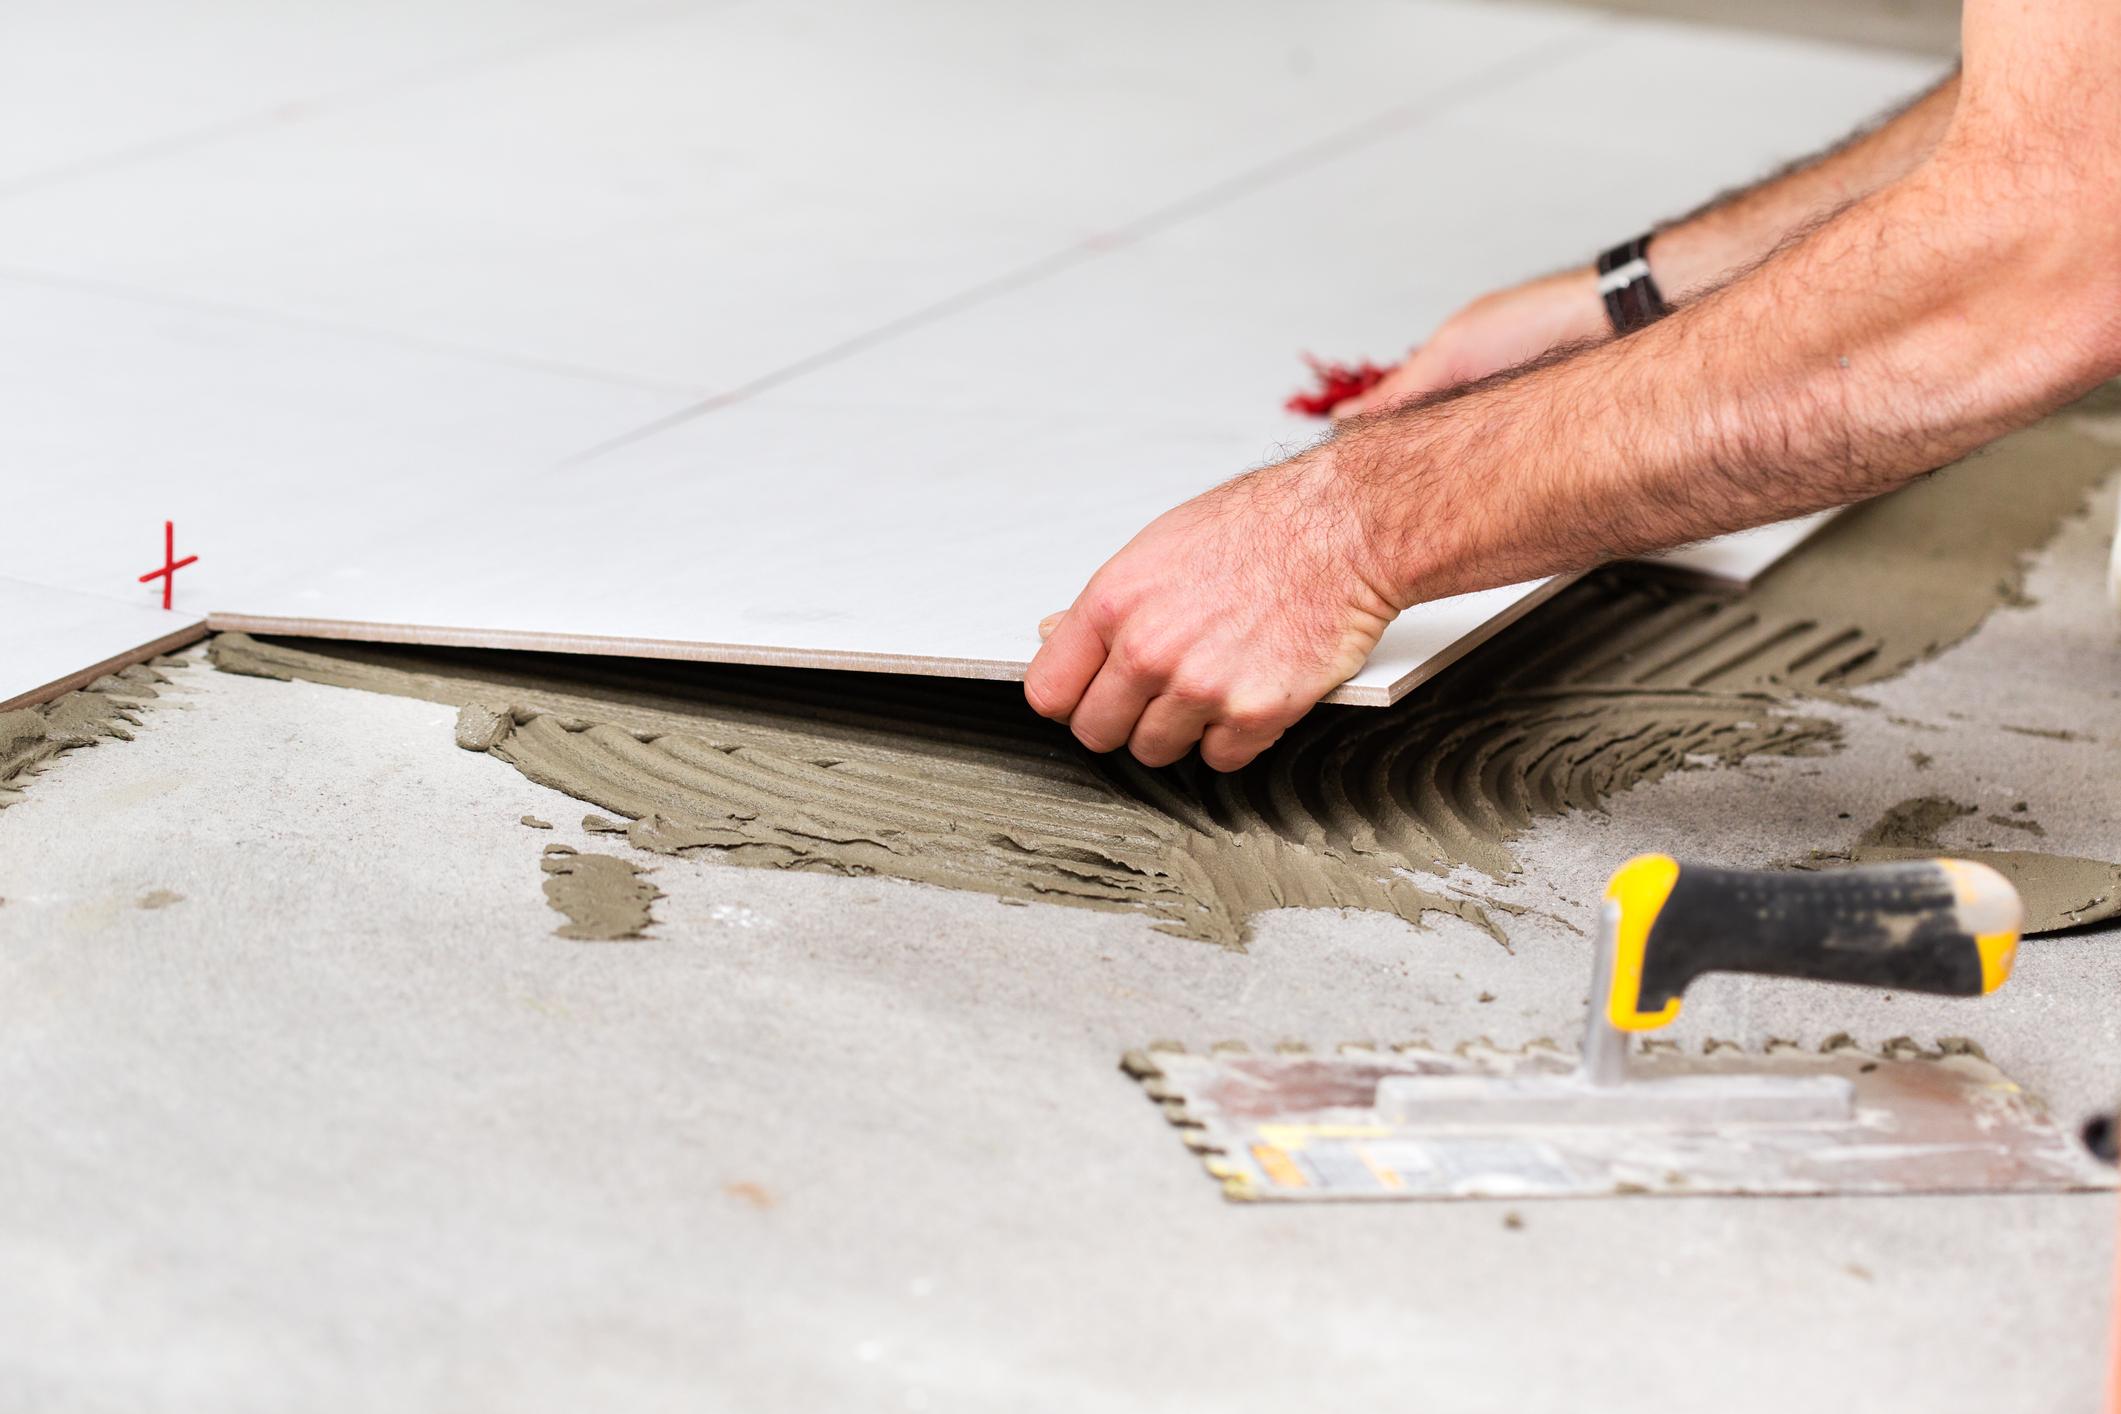 Home improvement - Worker installing tiles